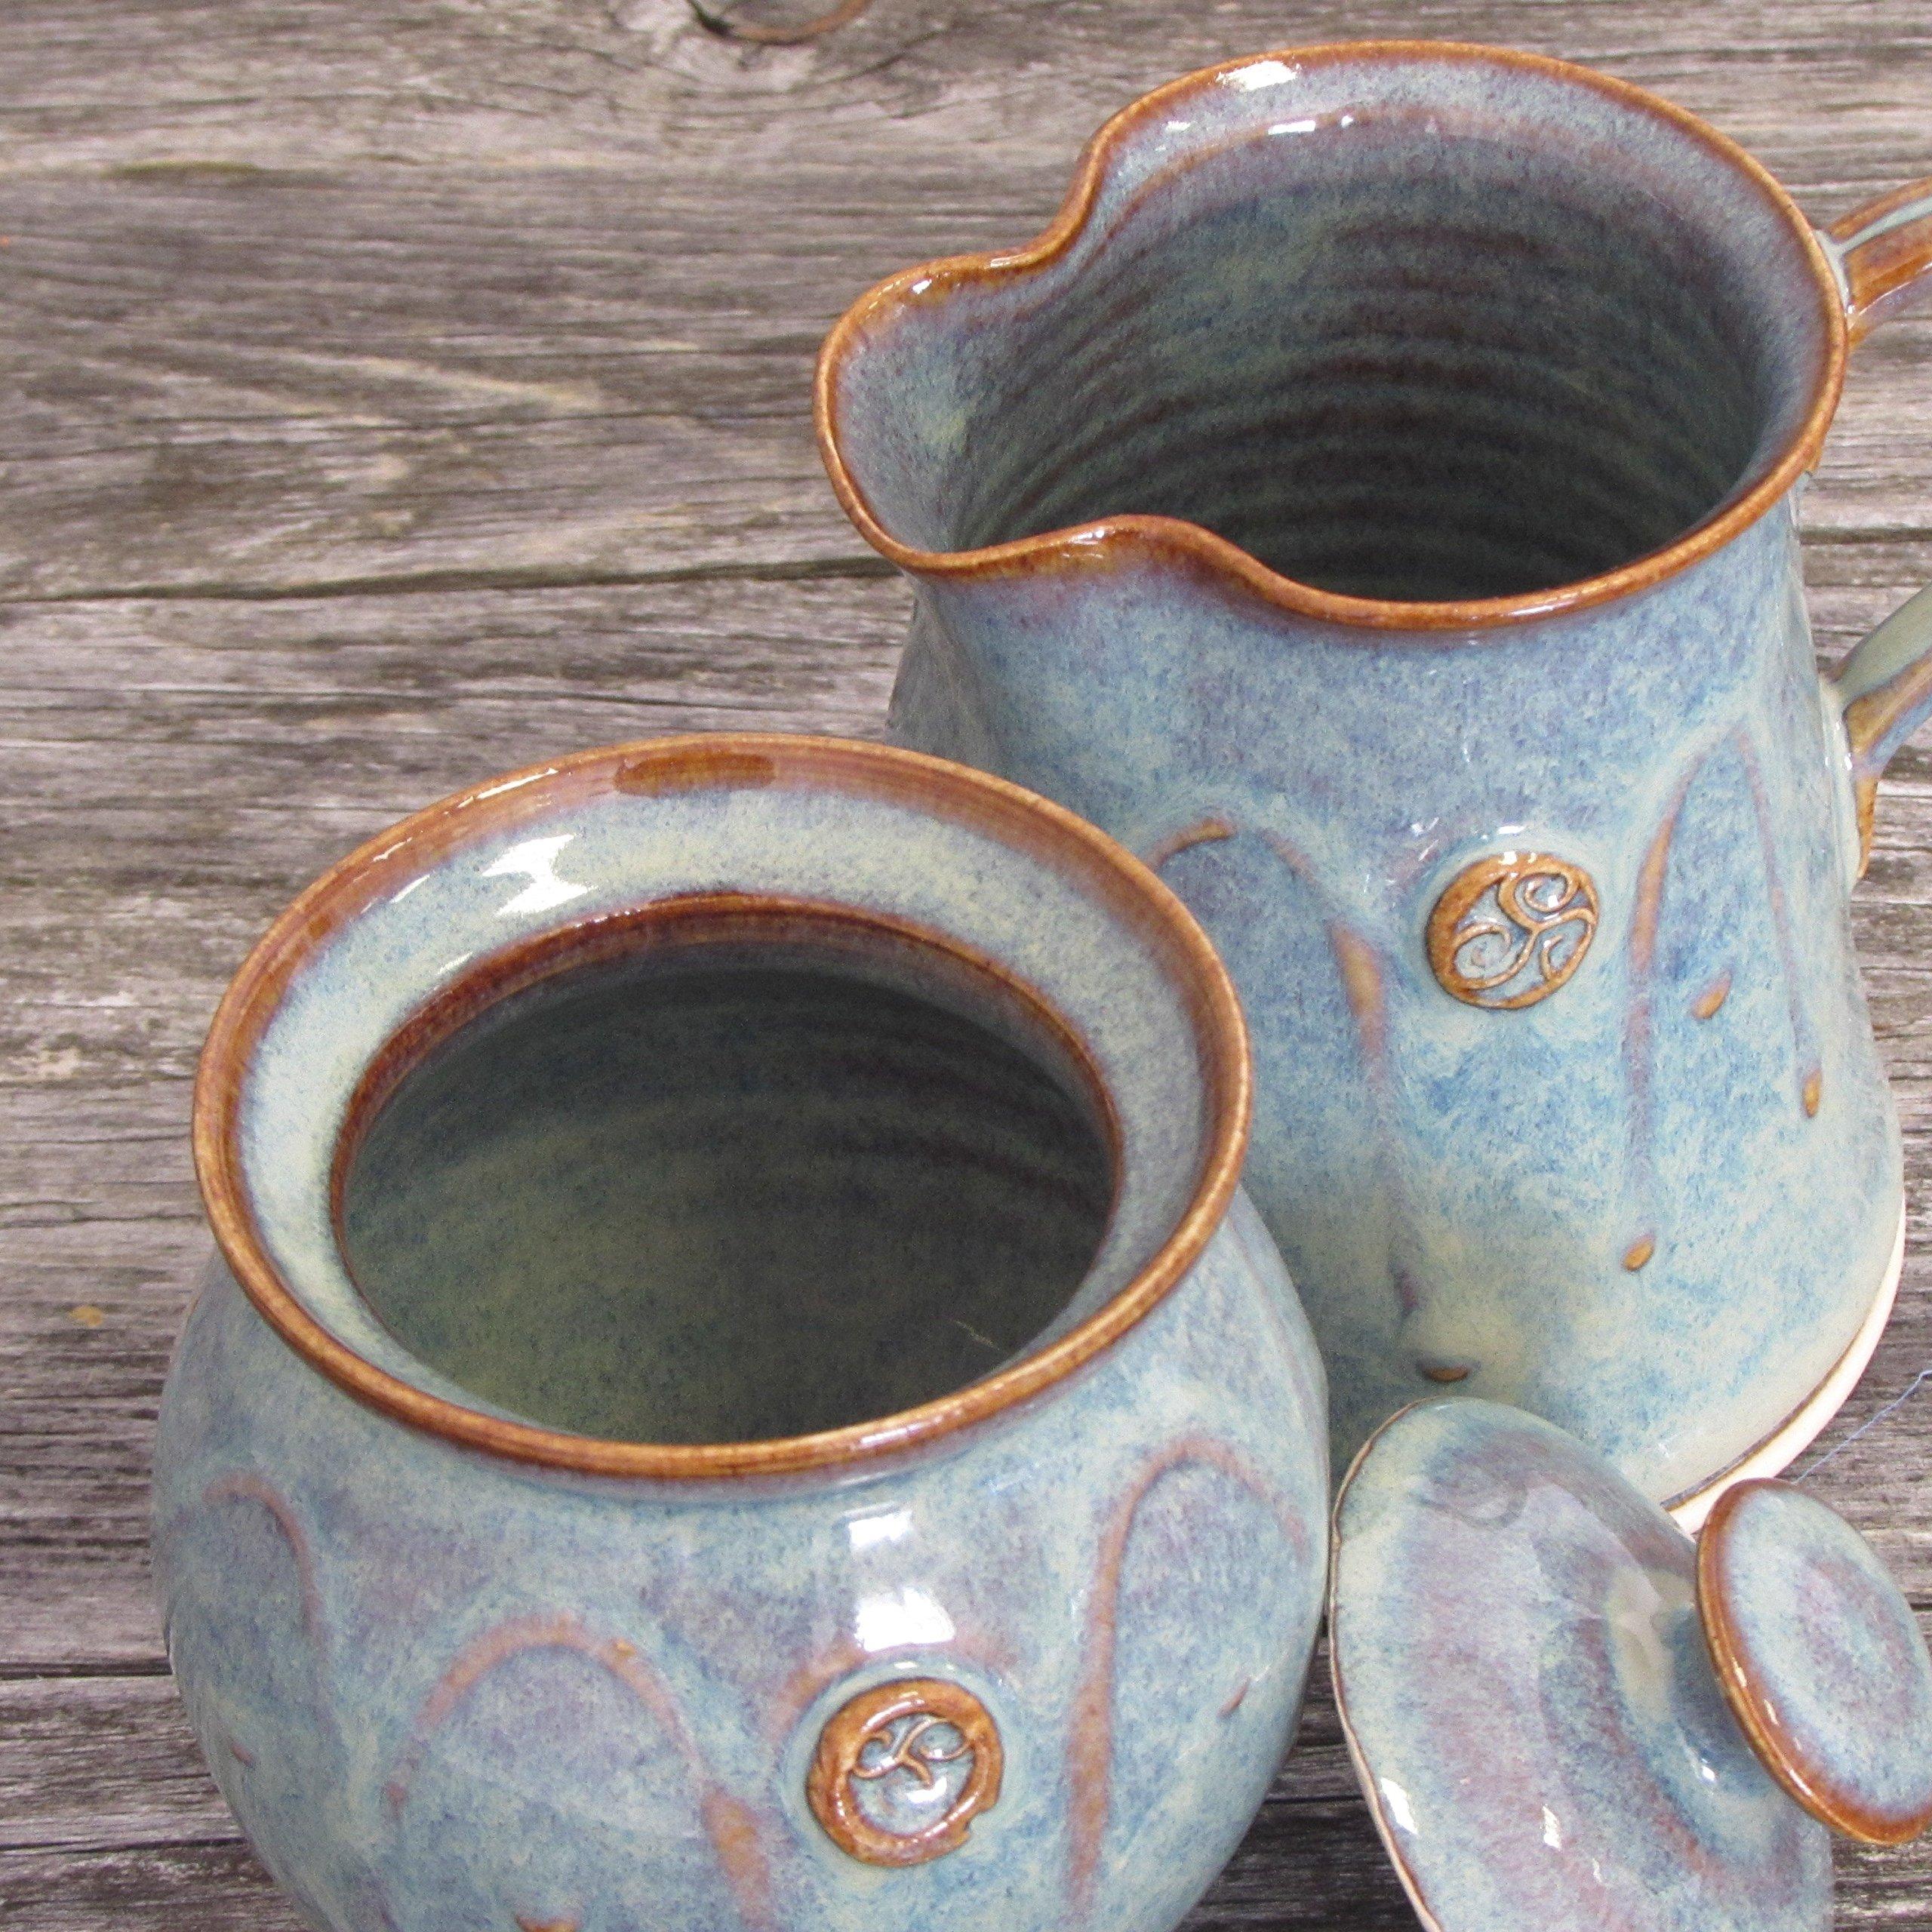 Handmade Irish Pottery Sugar and Creamer Set by Castle Arch Pottery Ireland (Image #4)